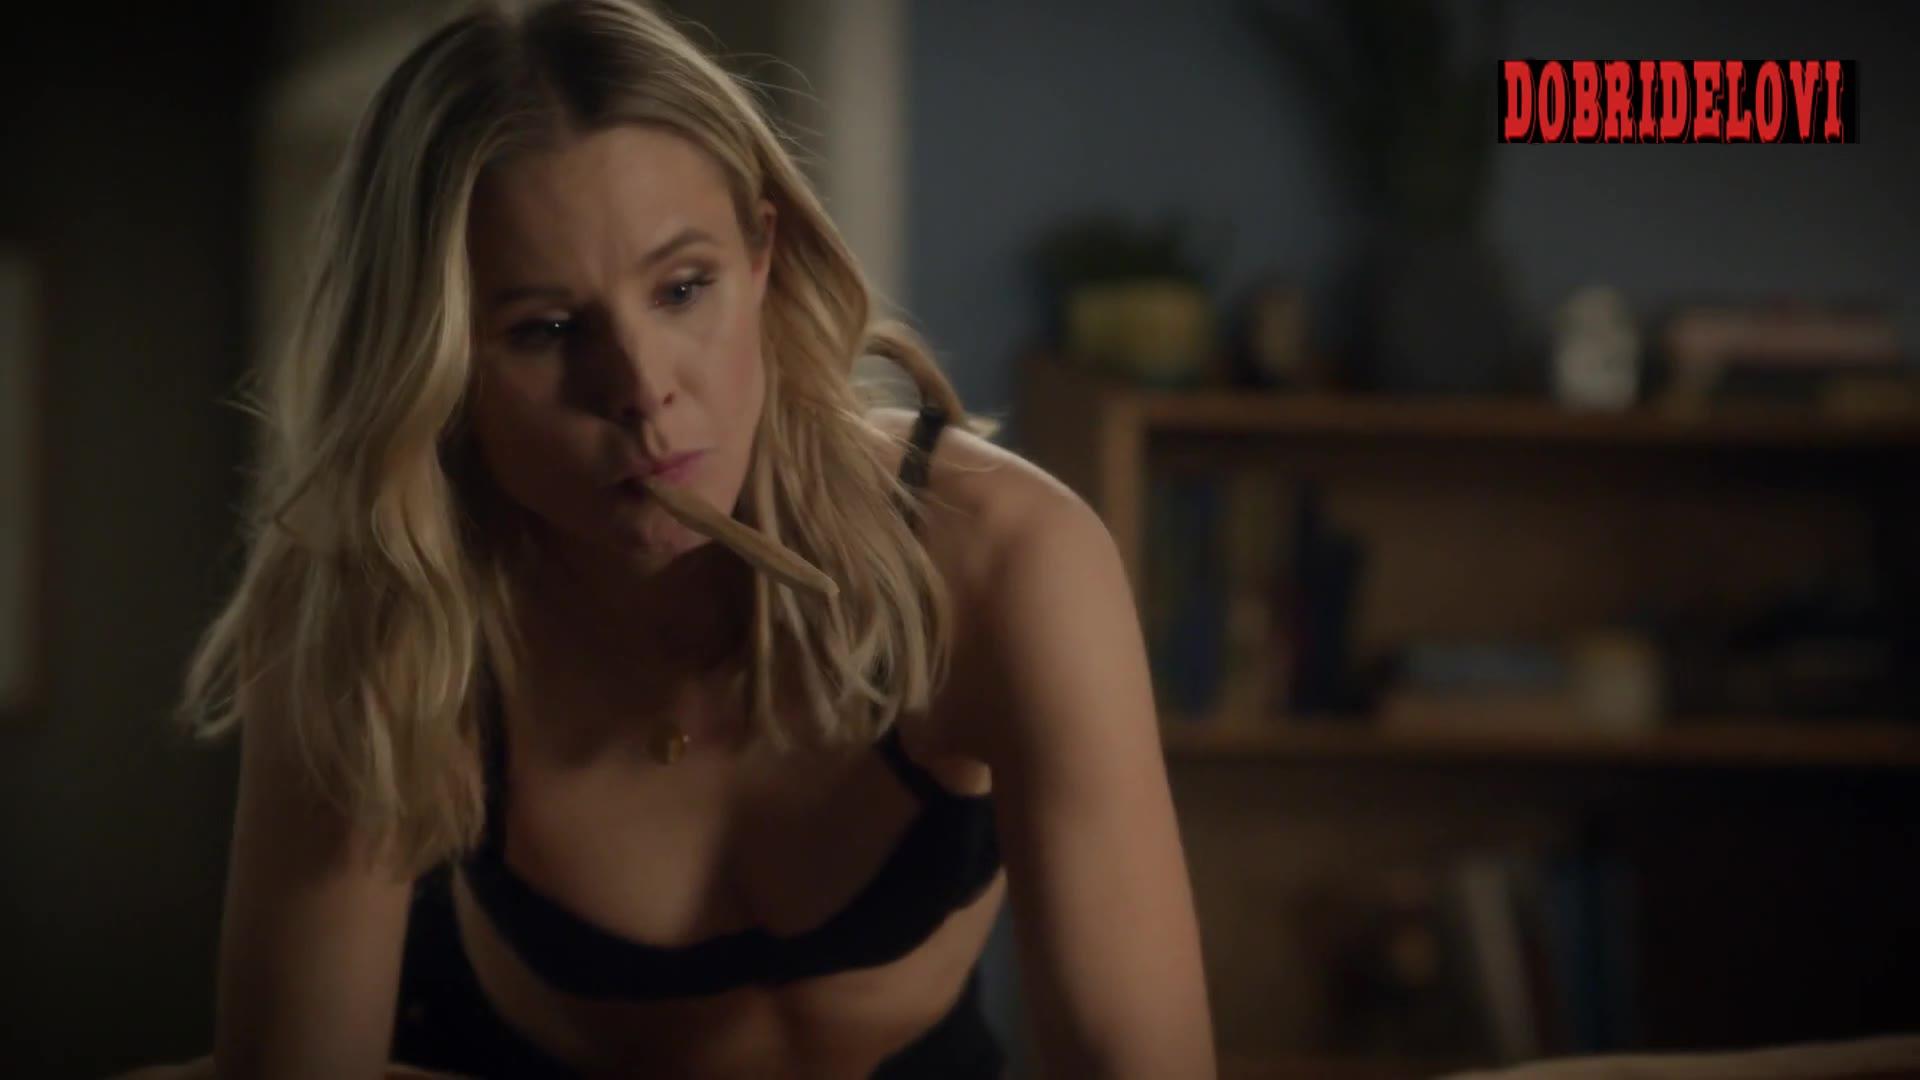 Kristen Bell bent over showing cleavage scene from Veronica Mars